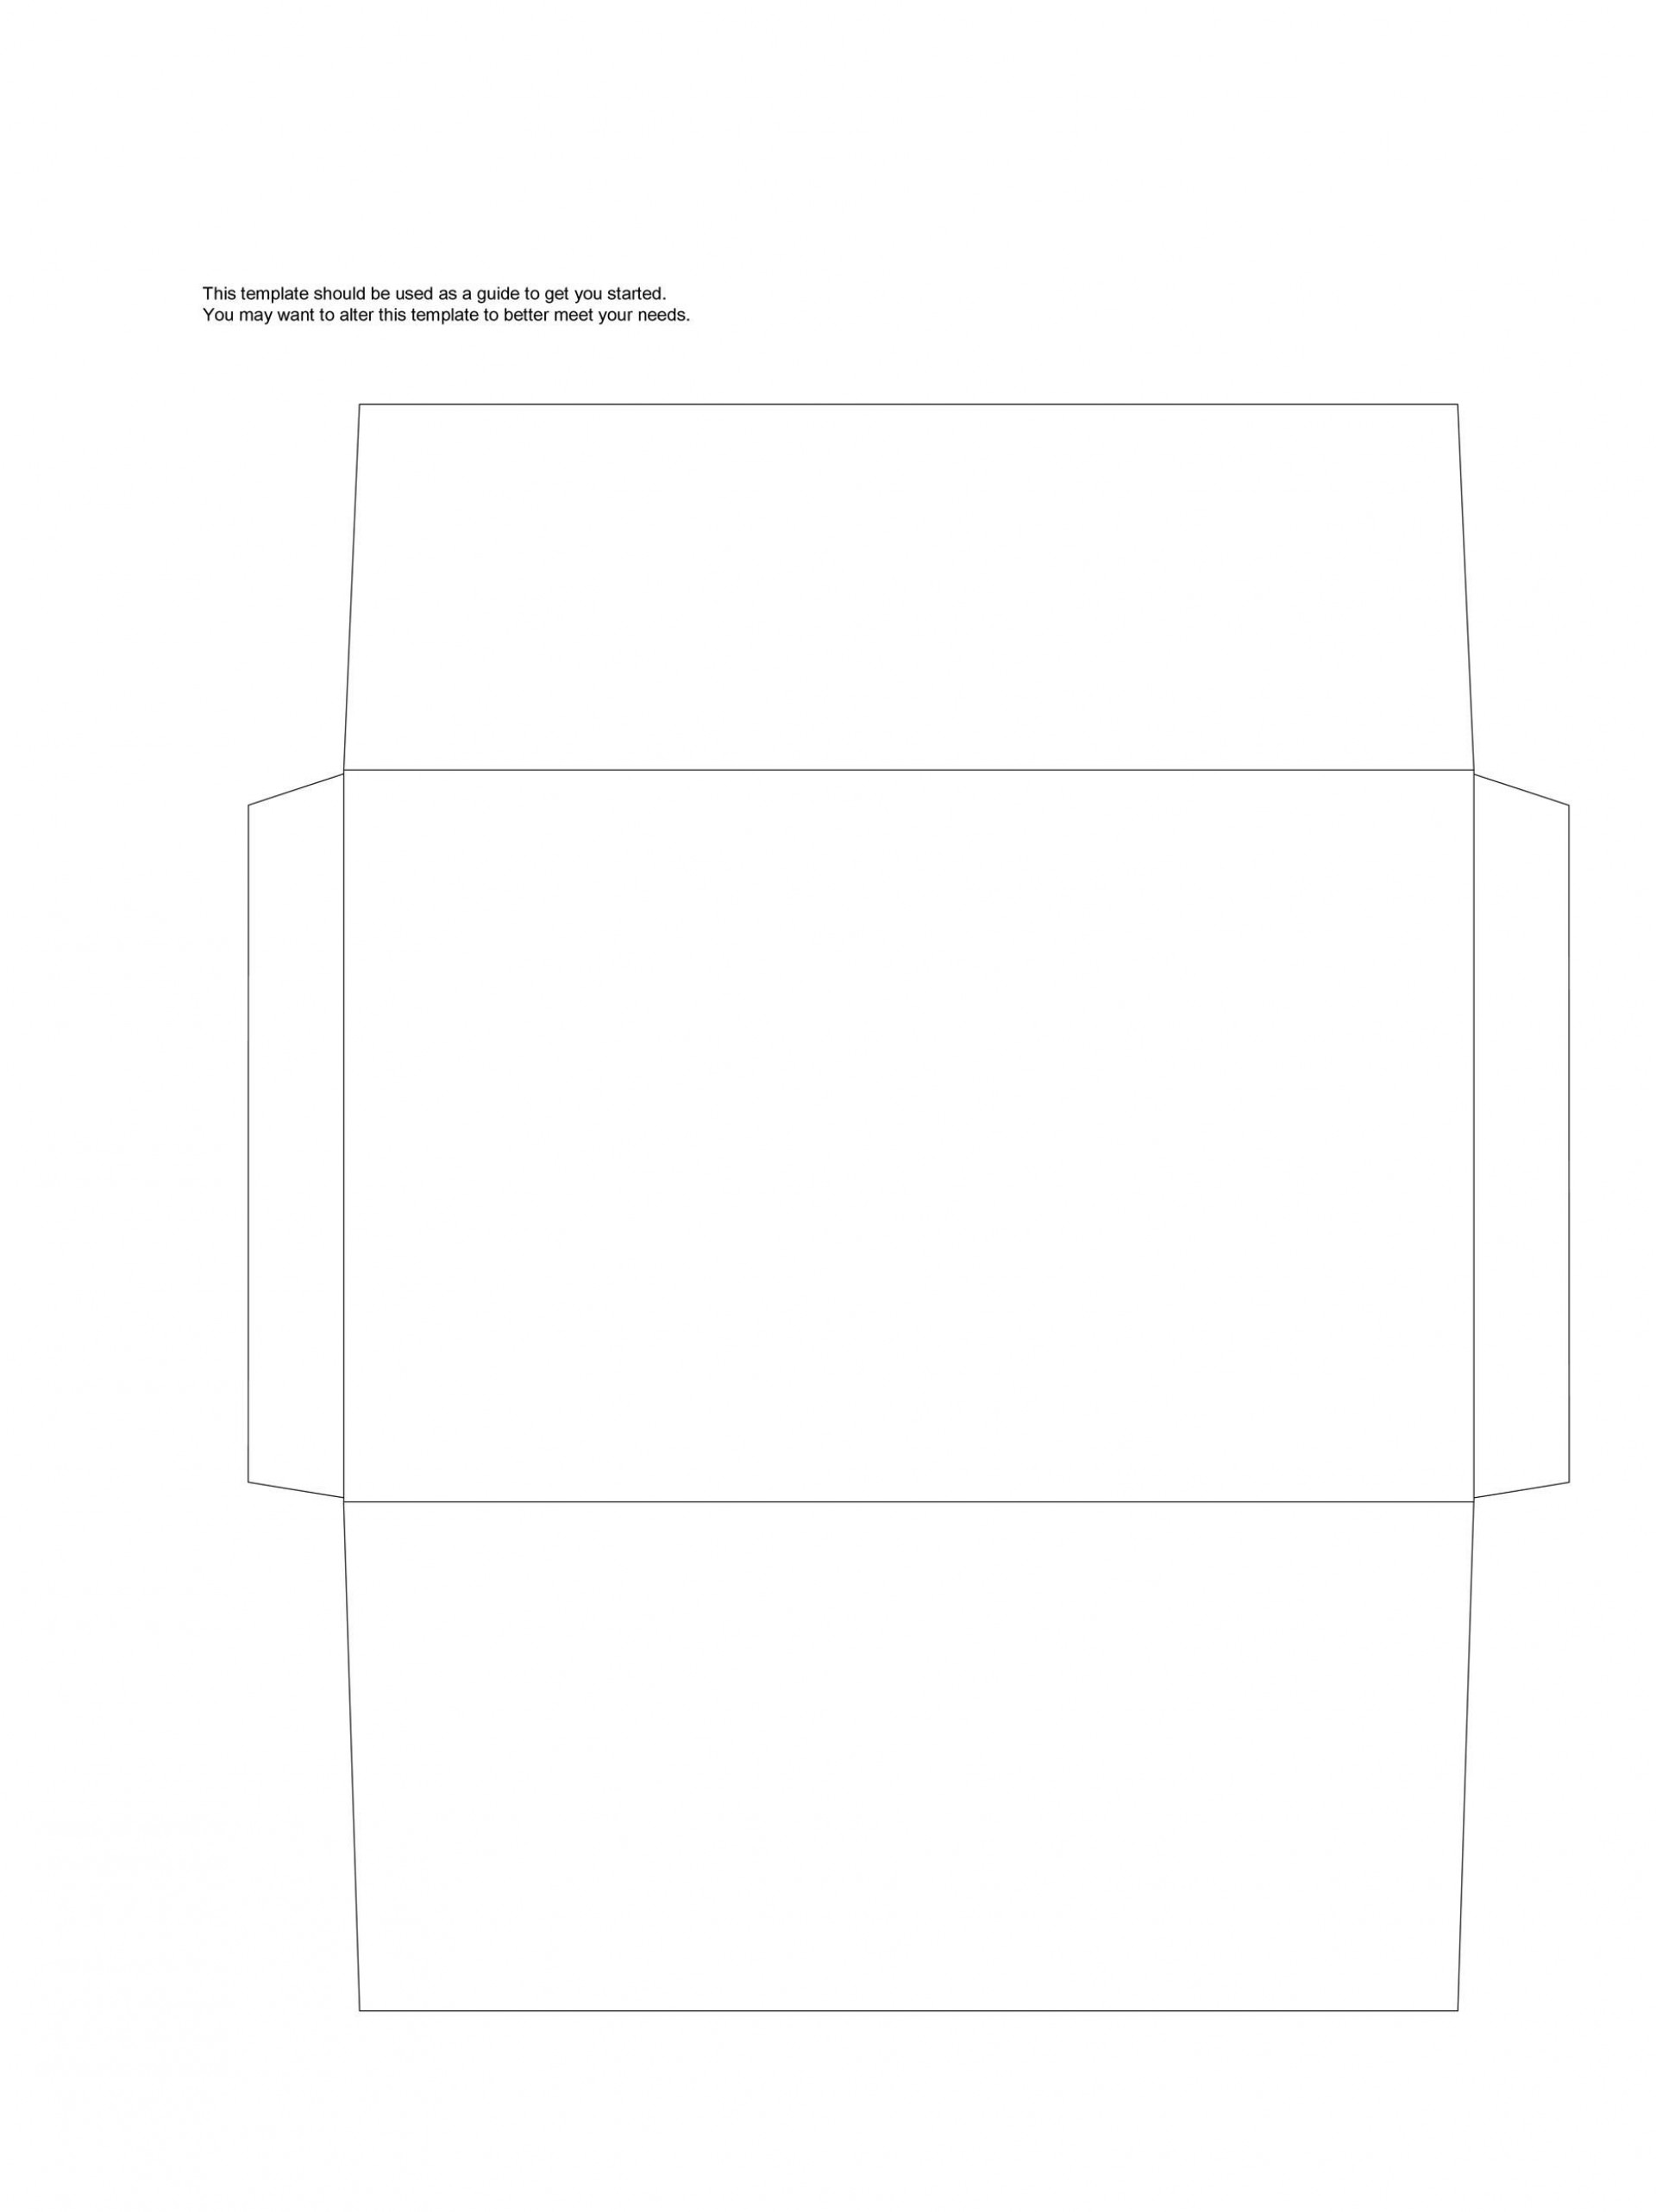 008 Astounding 10 Envelope Template Word Sample  Size Microsoft #10 Double Window1920